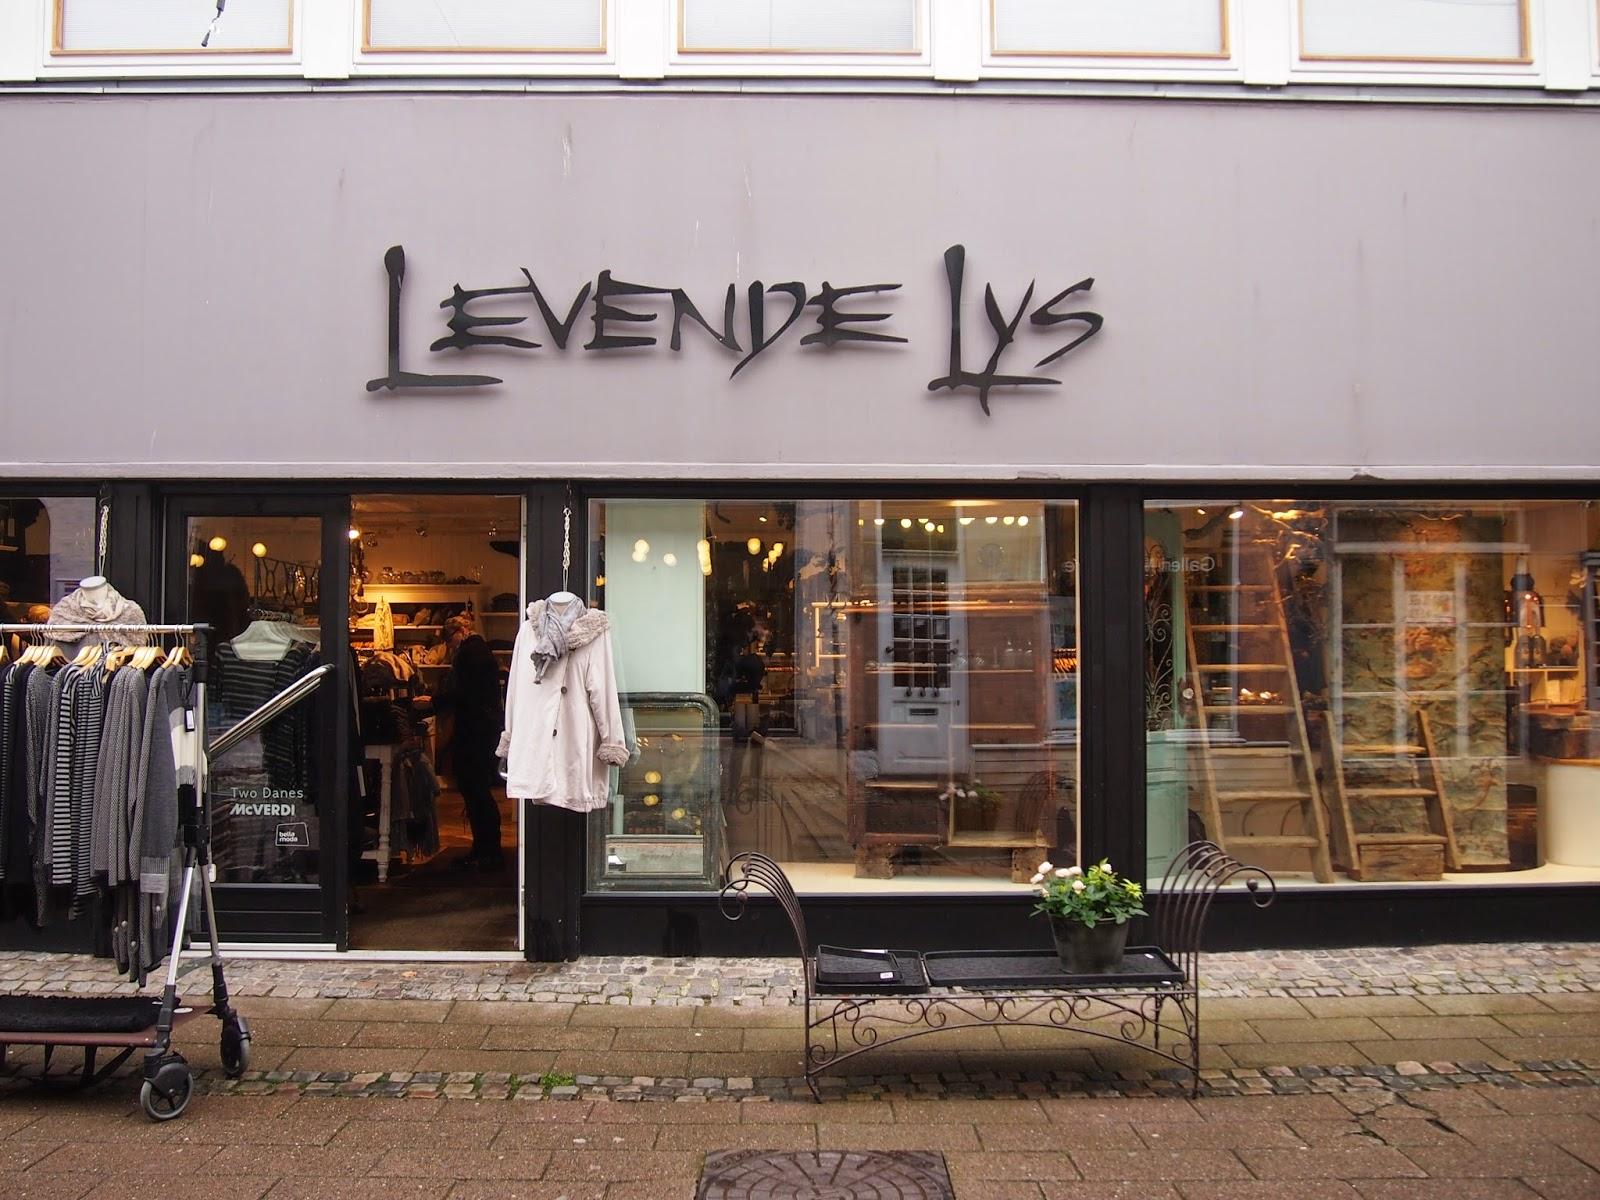 Levende Lys shop in Helsingor